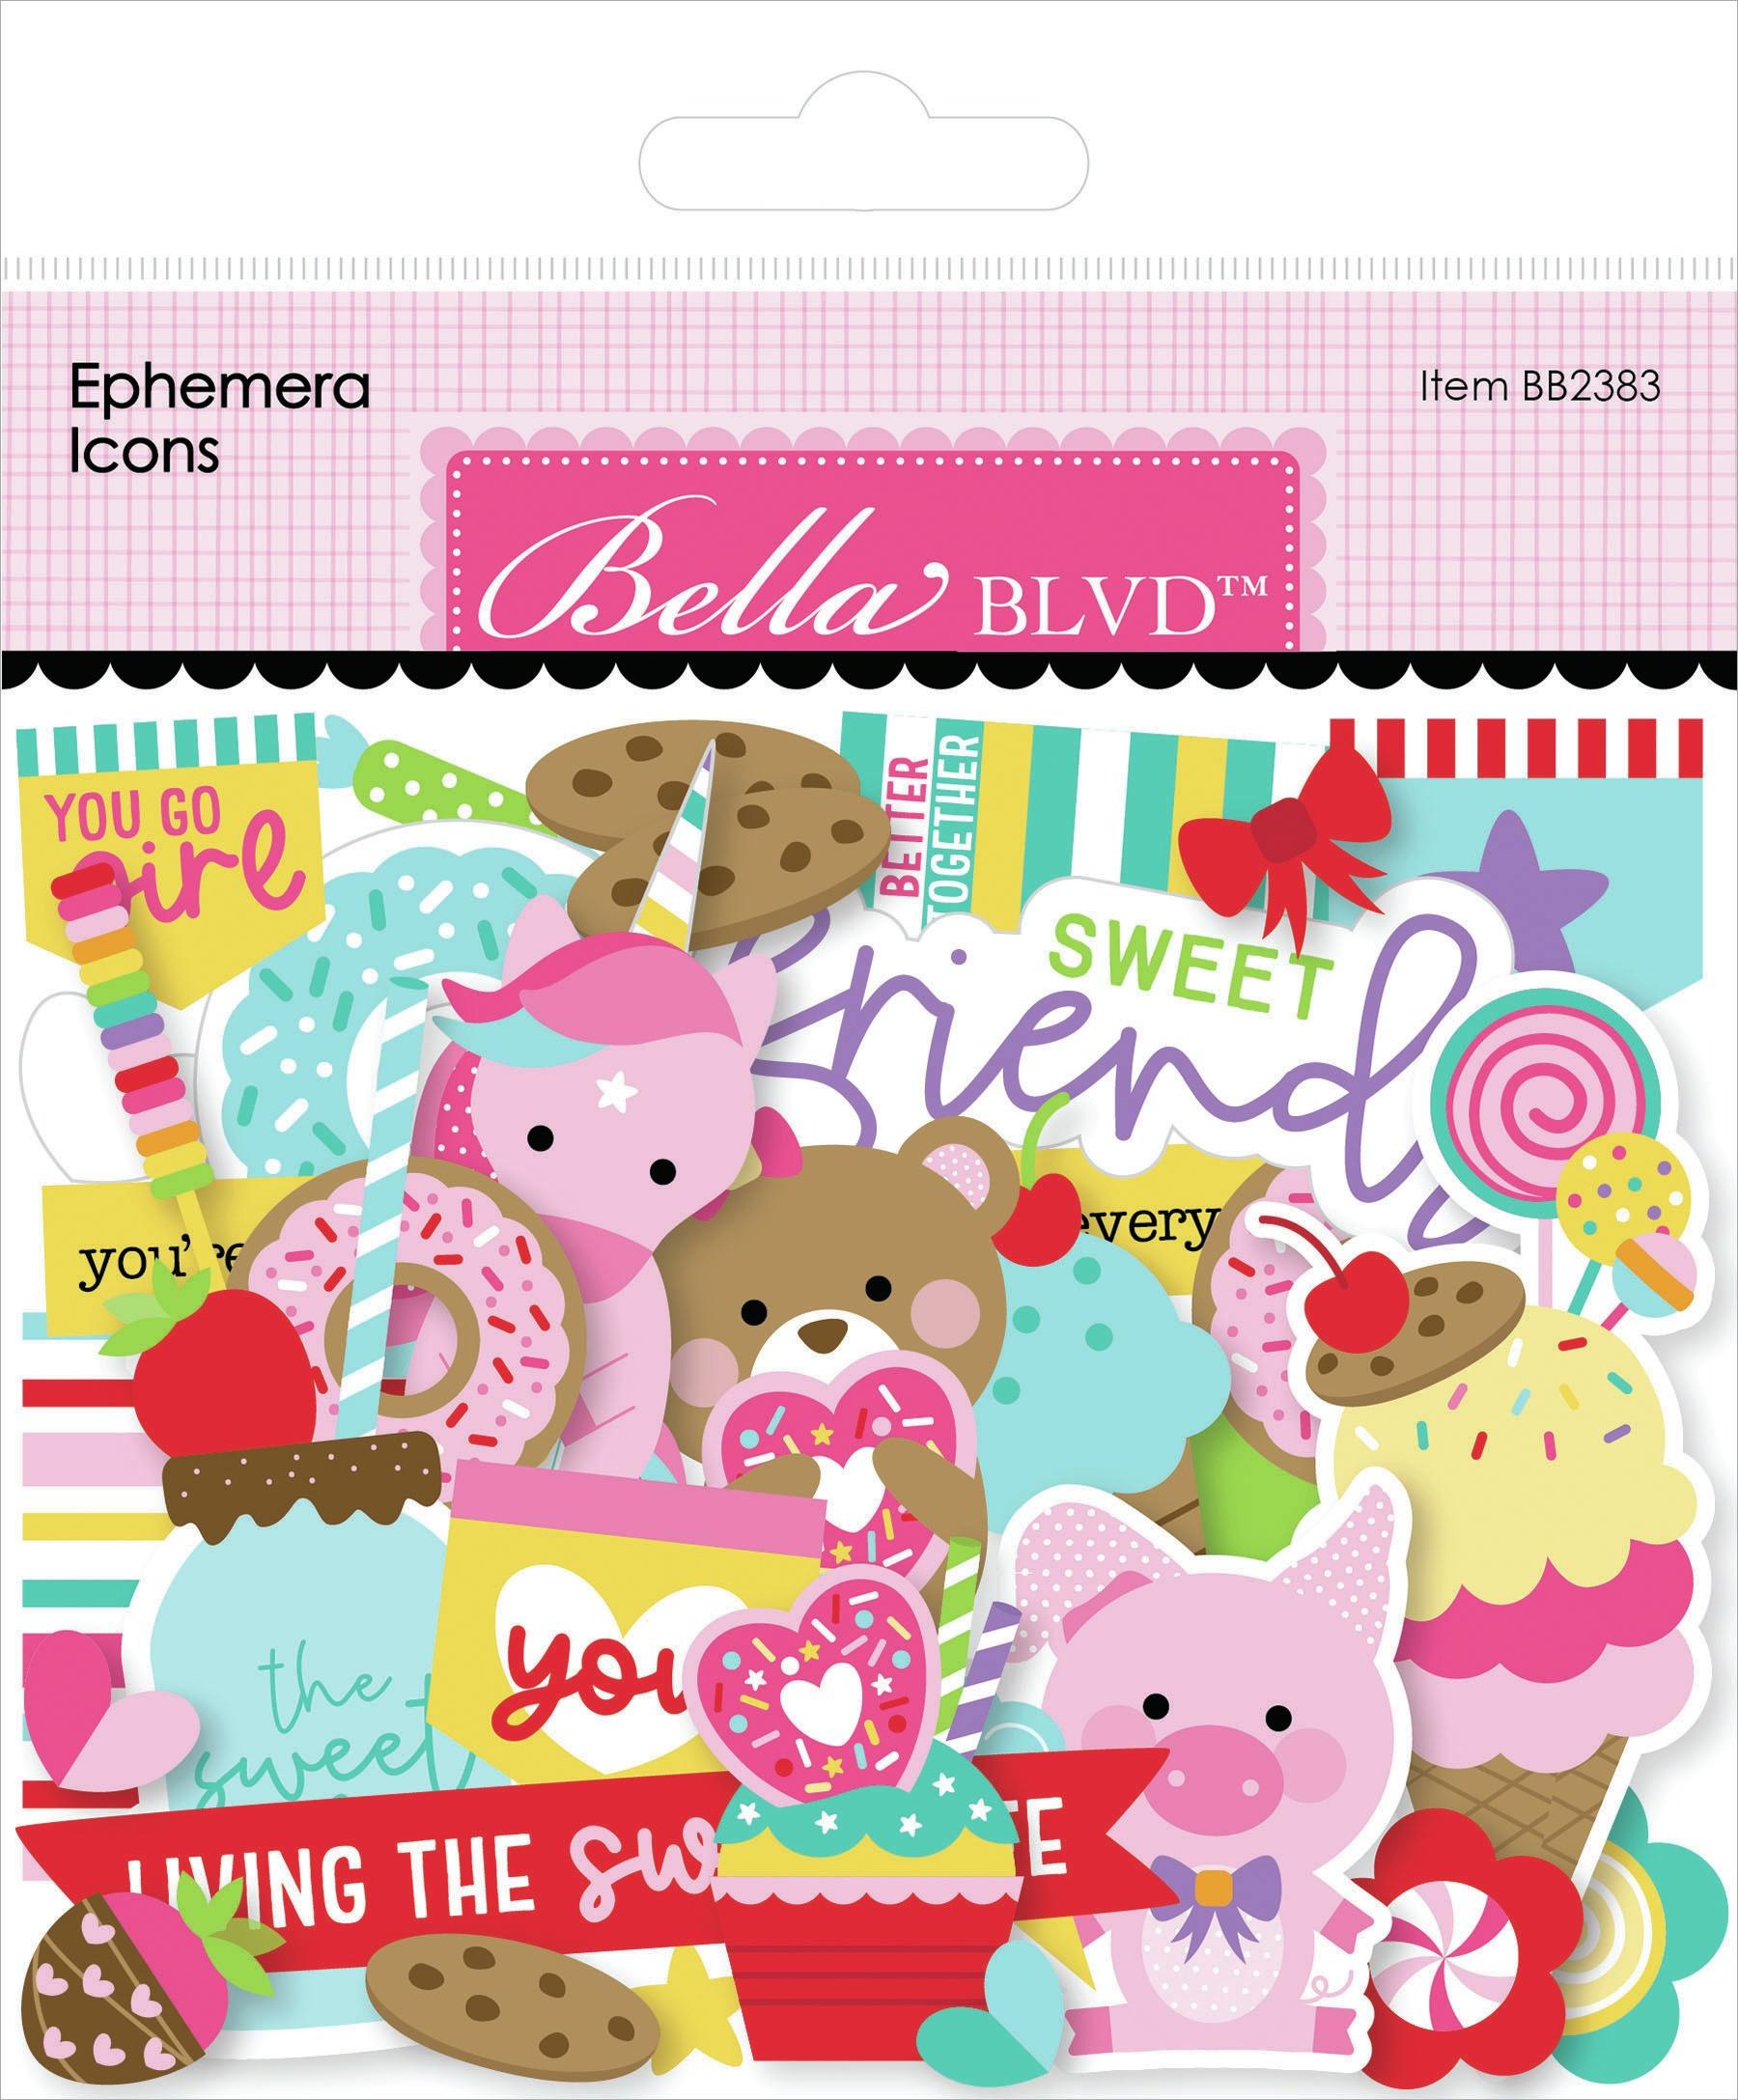 Bella Blvd Cardstock Ephemera -Icons, My Candy Girl